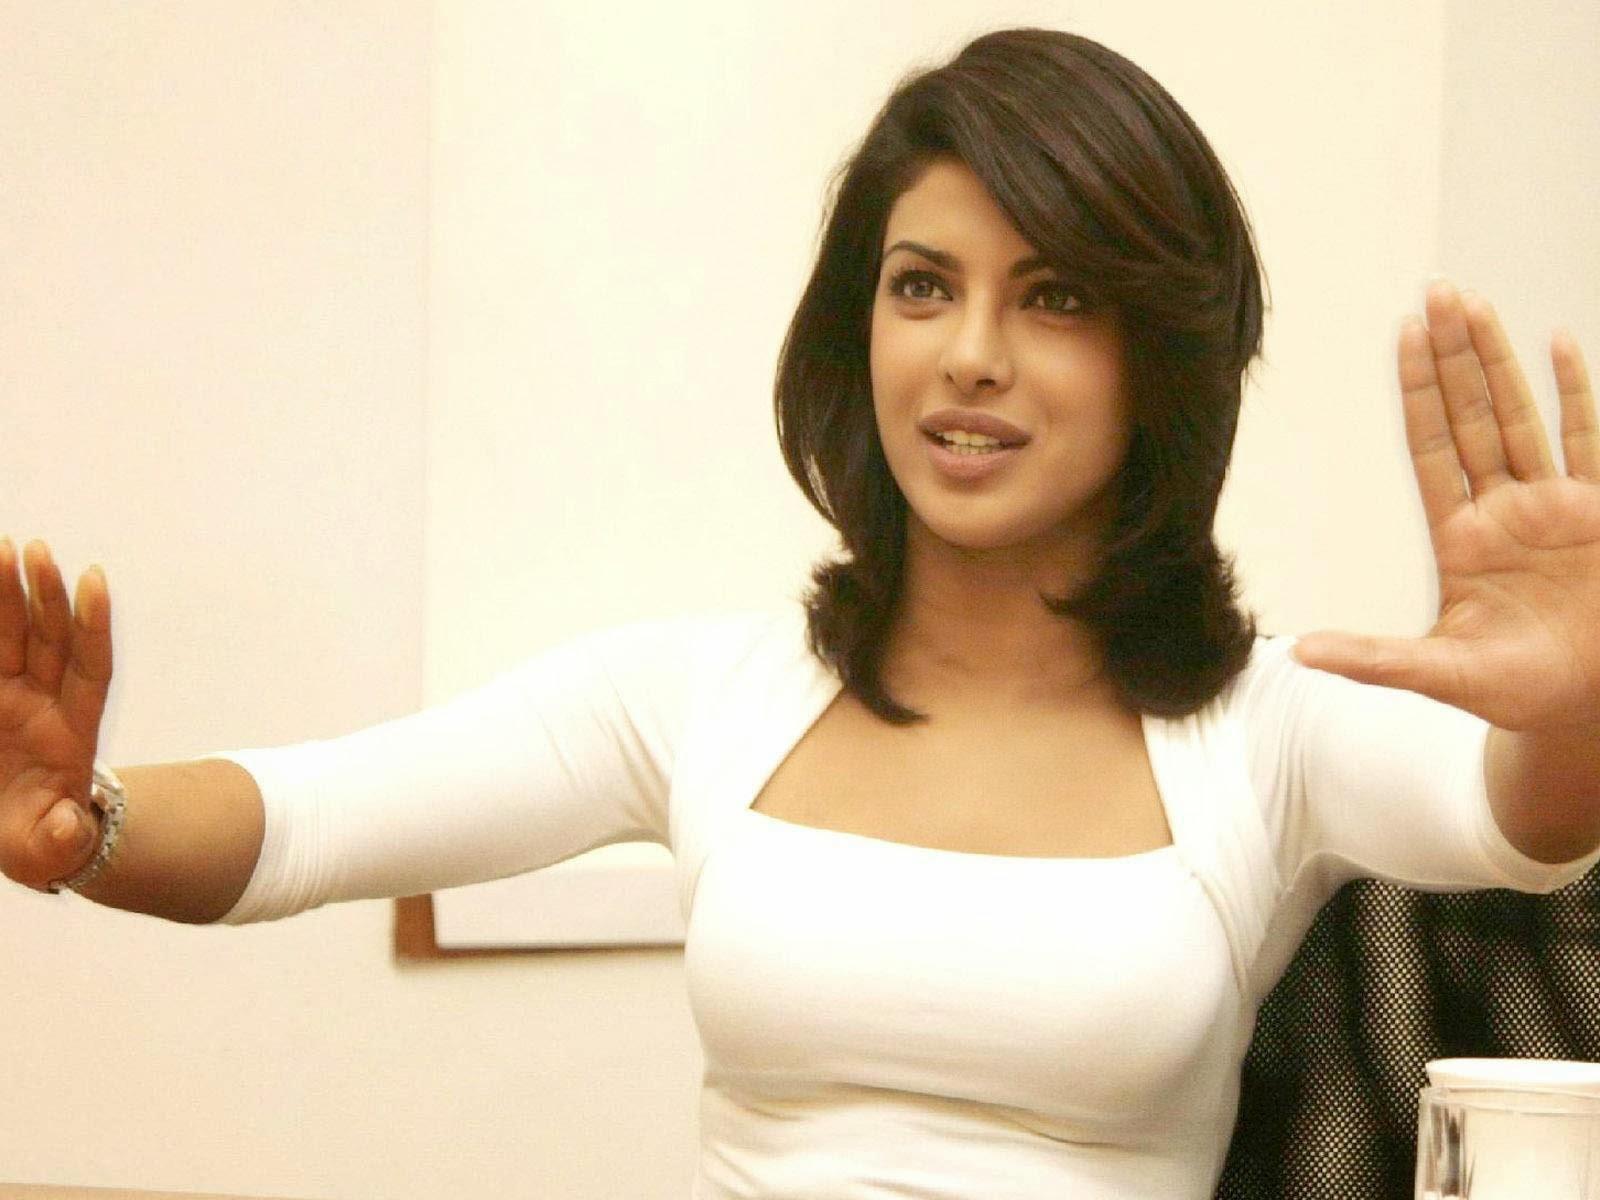 priyanka chopra breast photo